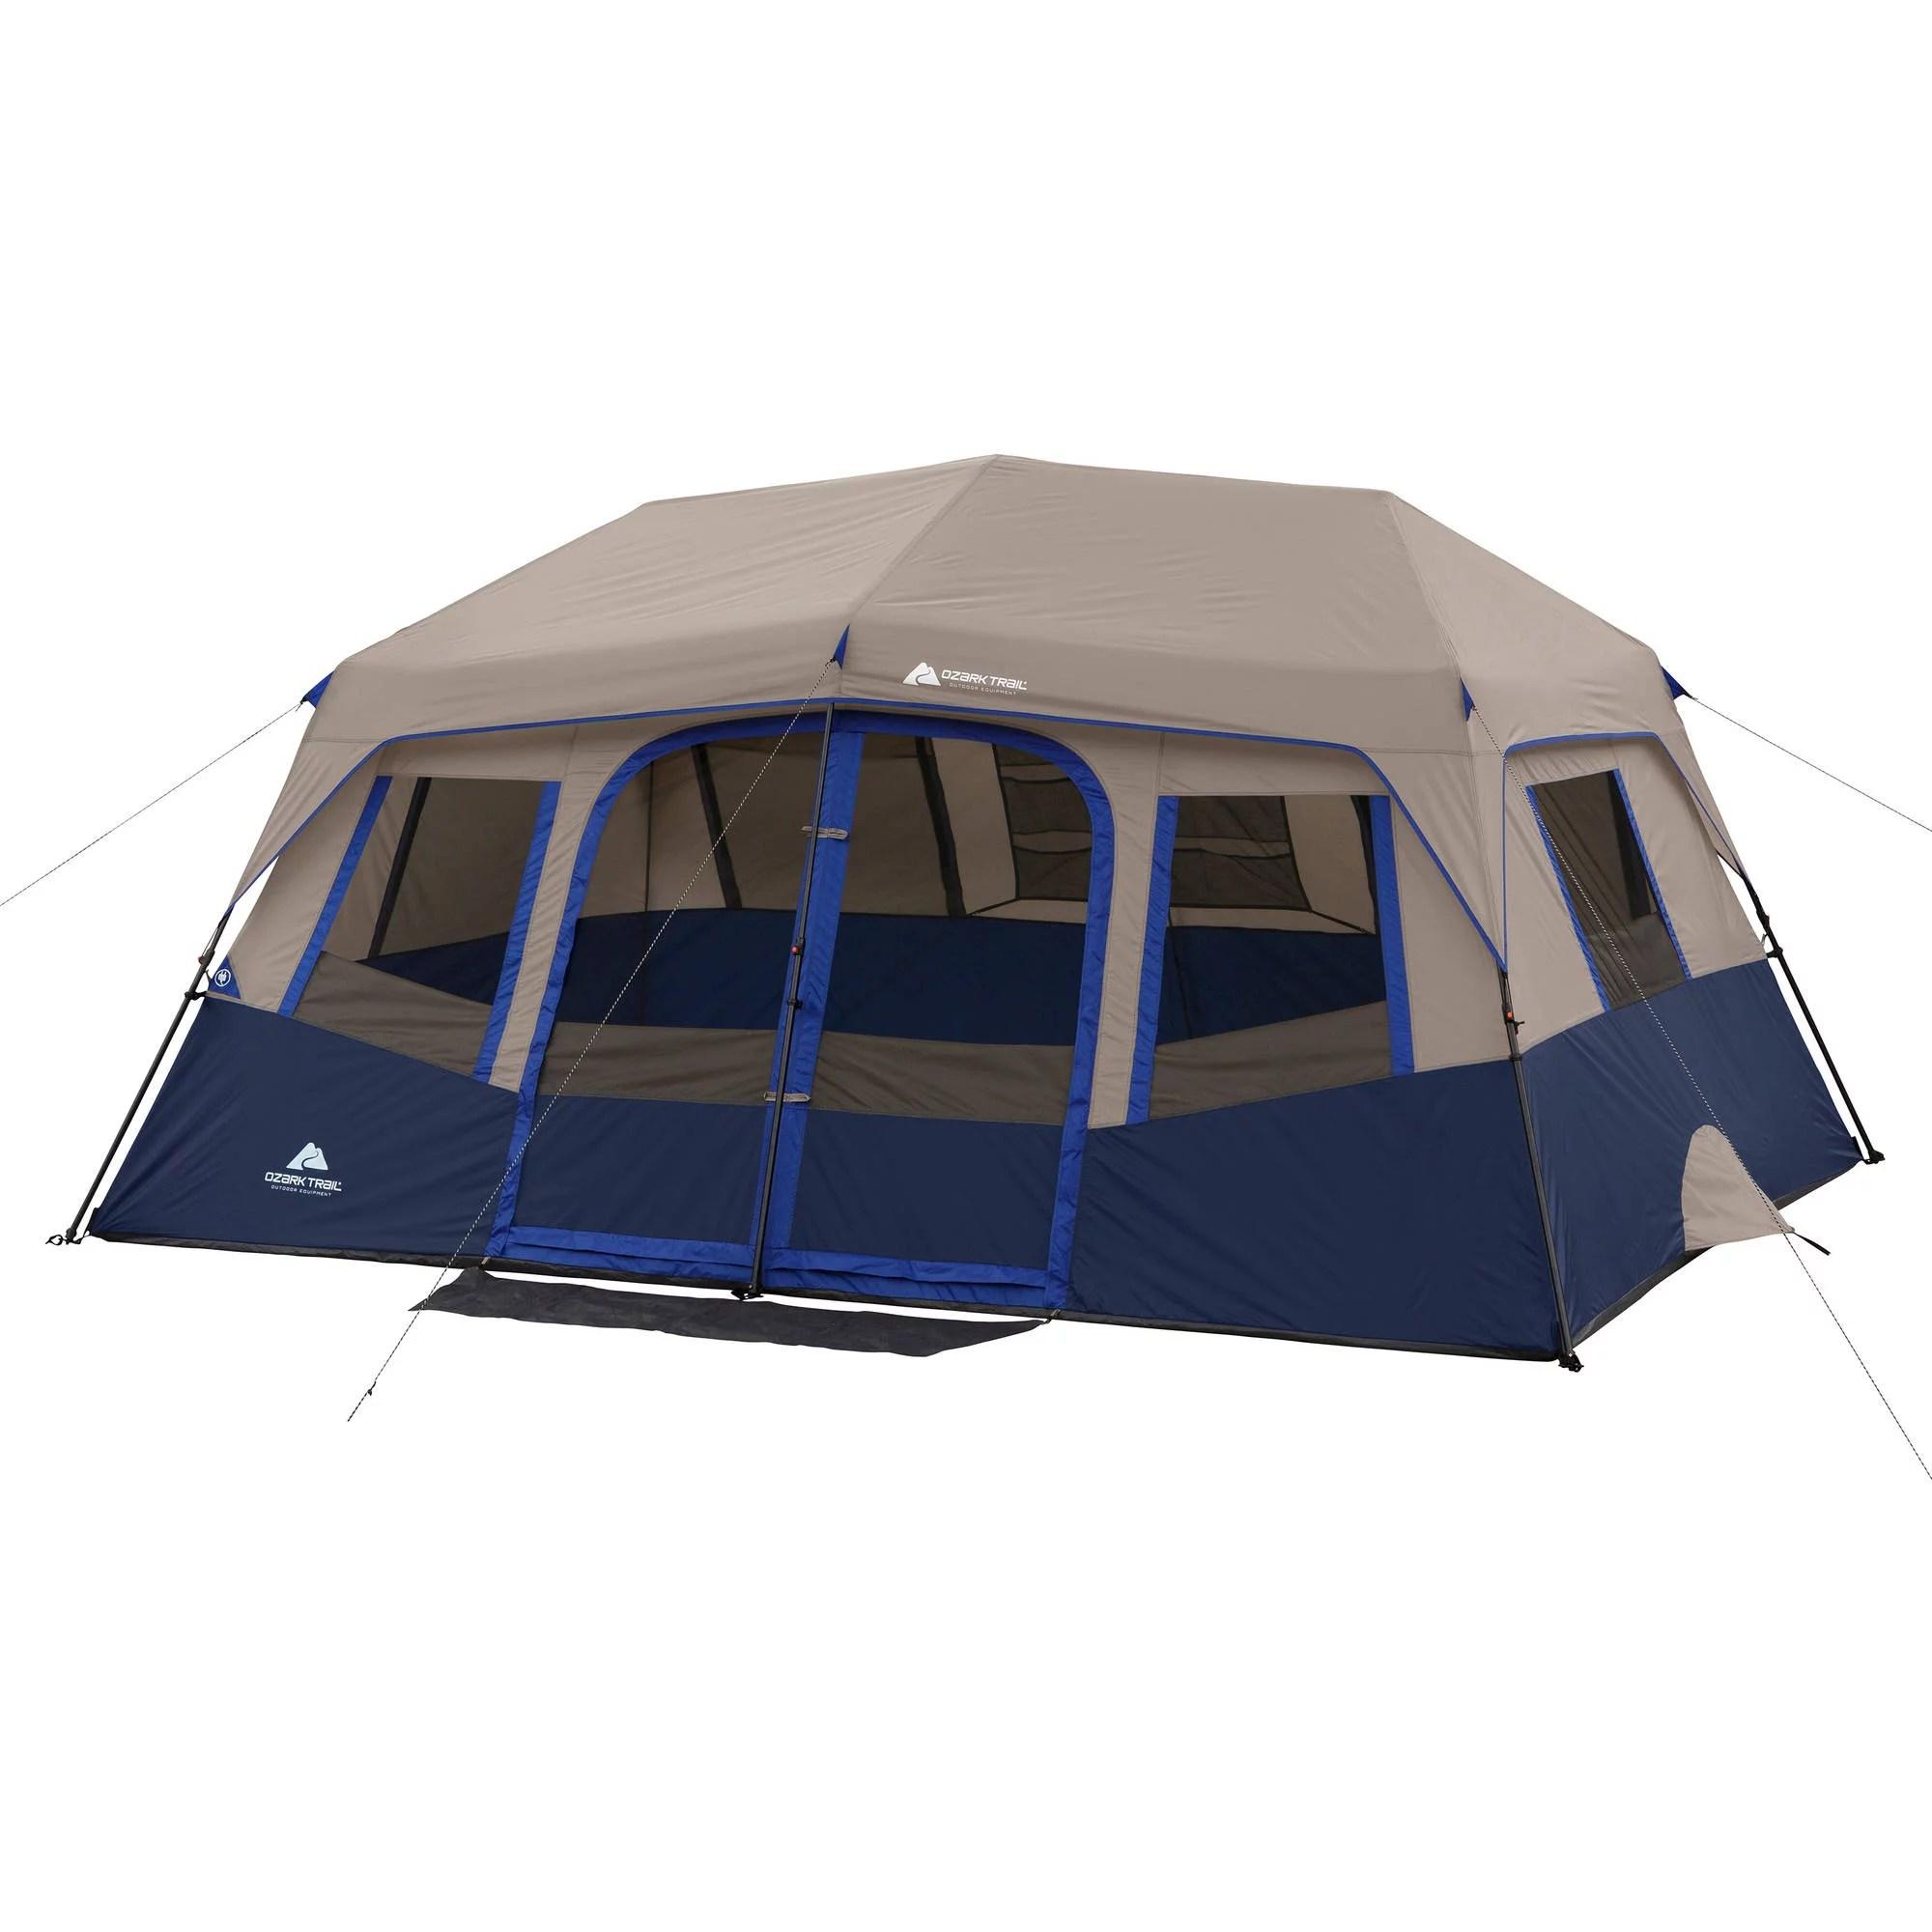 Ozark Trail 10 Person 2 Room Instant Cabin Tent  Walmartcom